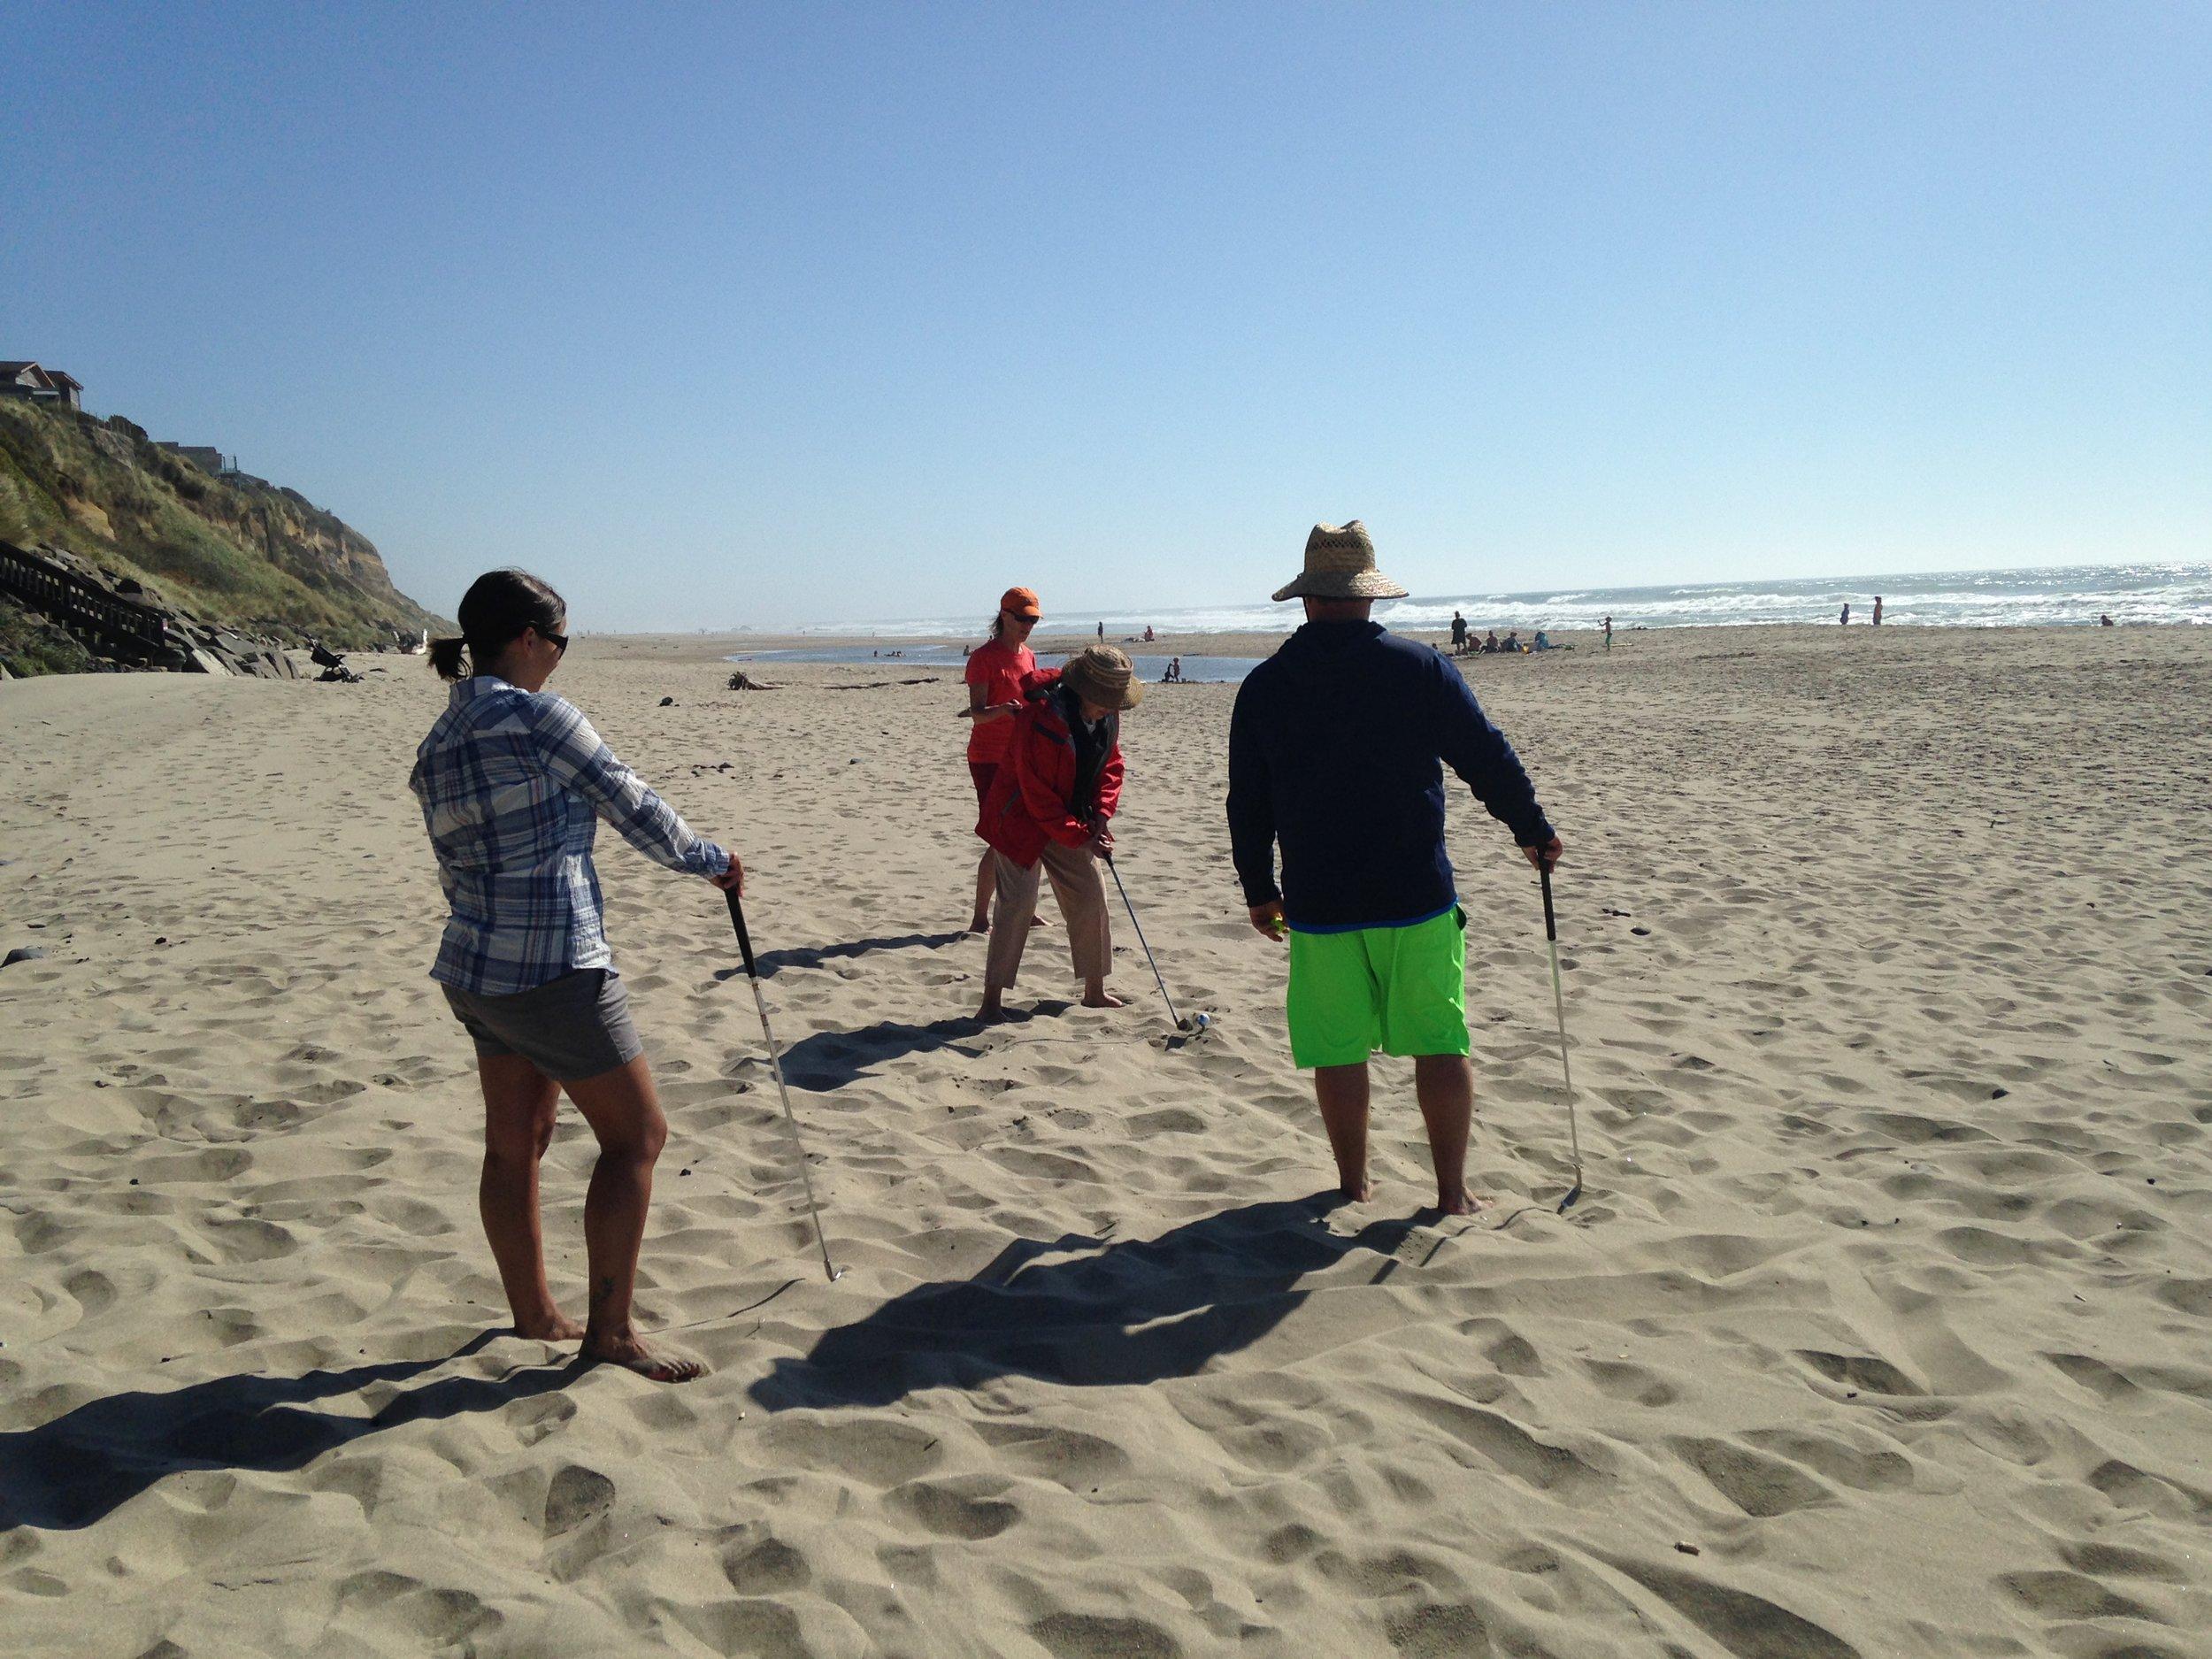 Beach golf - always fun for everyone.